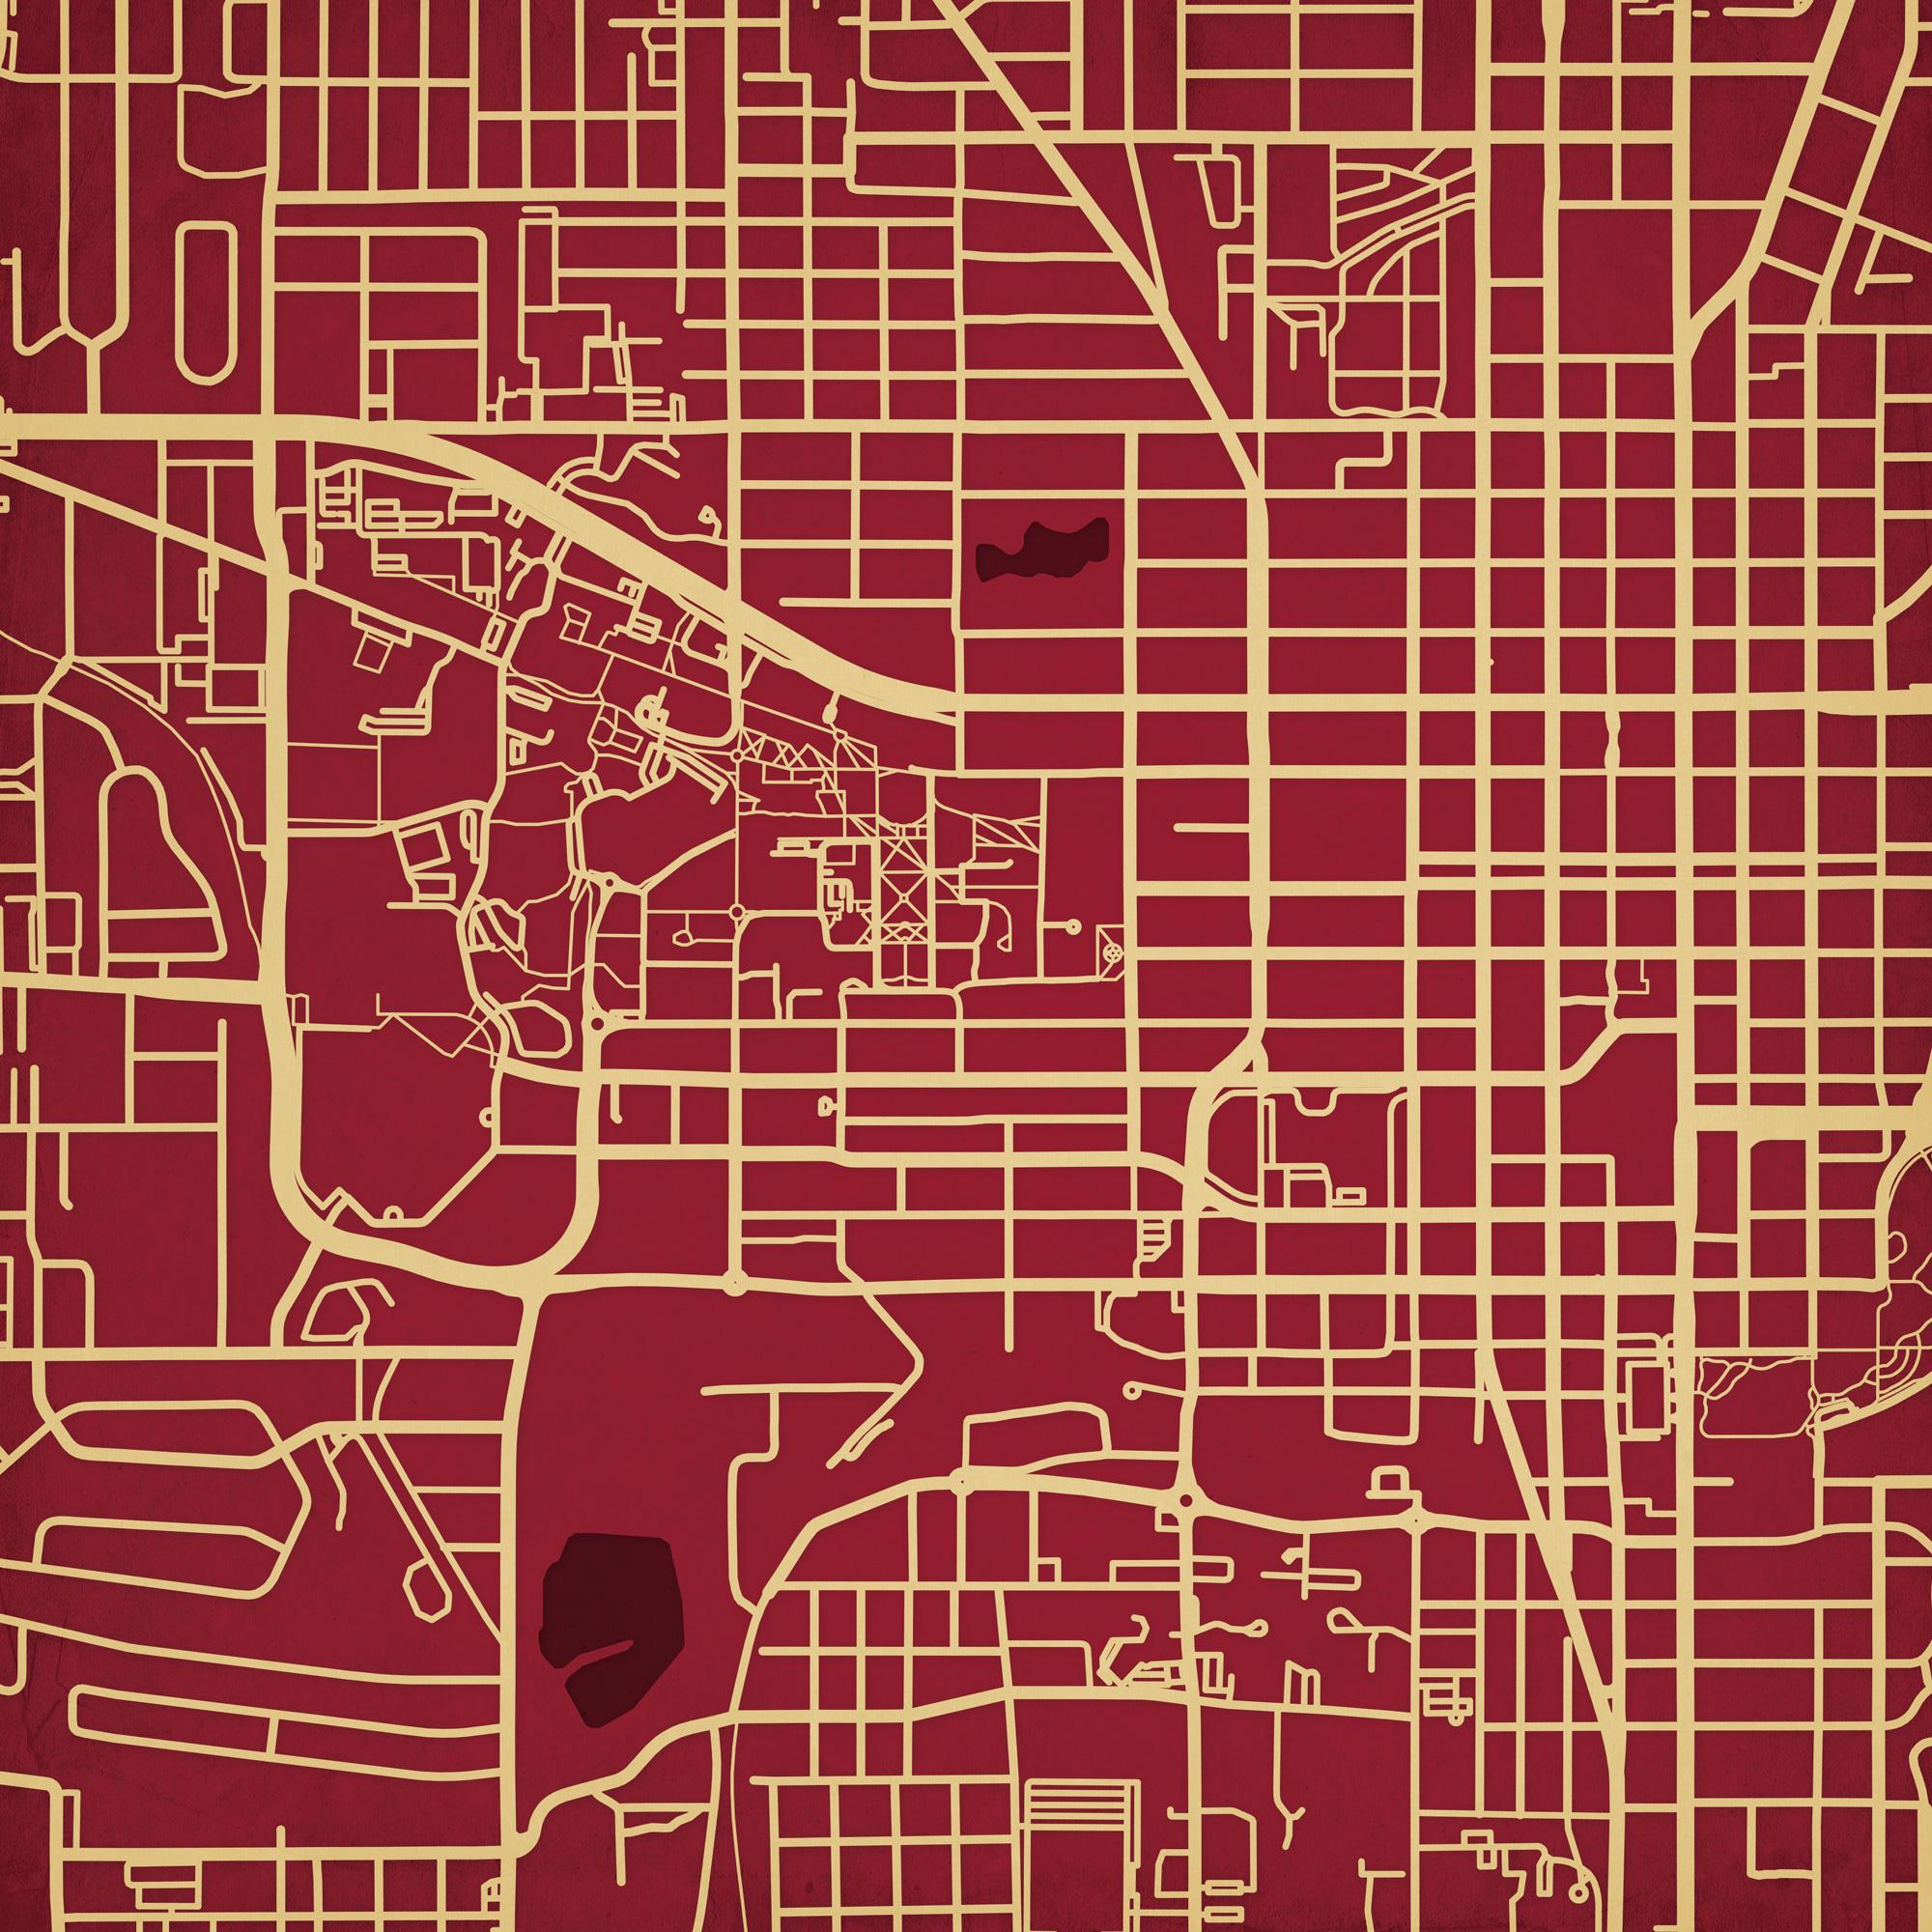 Florida State Campus Map.Florida State University Campus Map Art City Prints